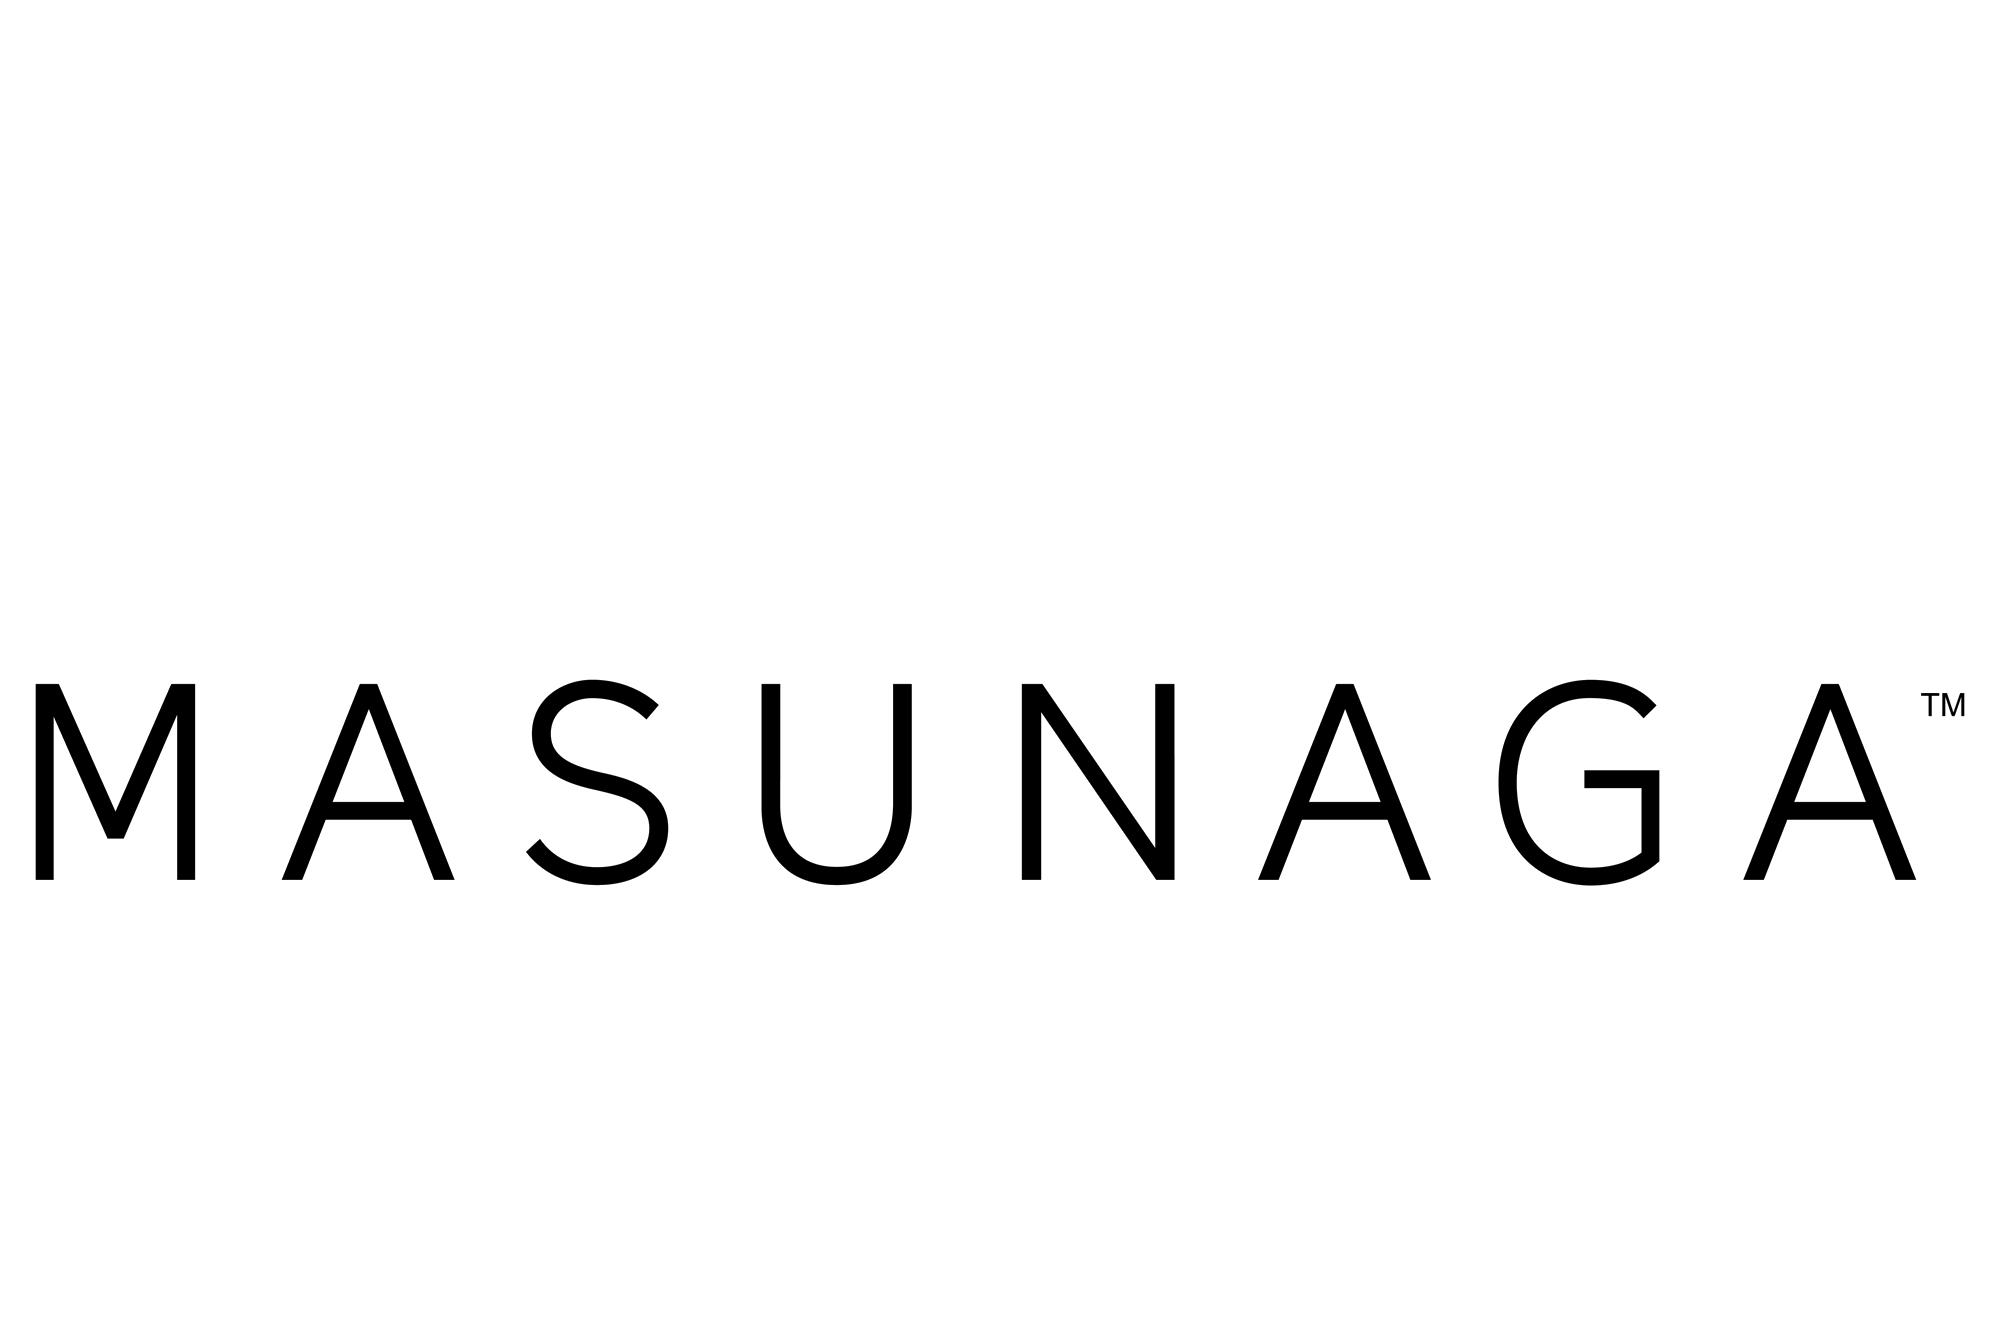 Masunaga - Date Line, Black-Silver